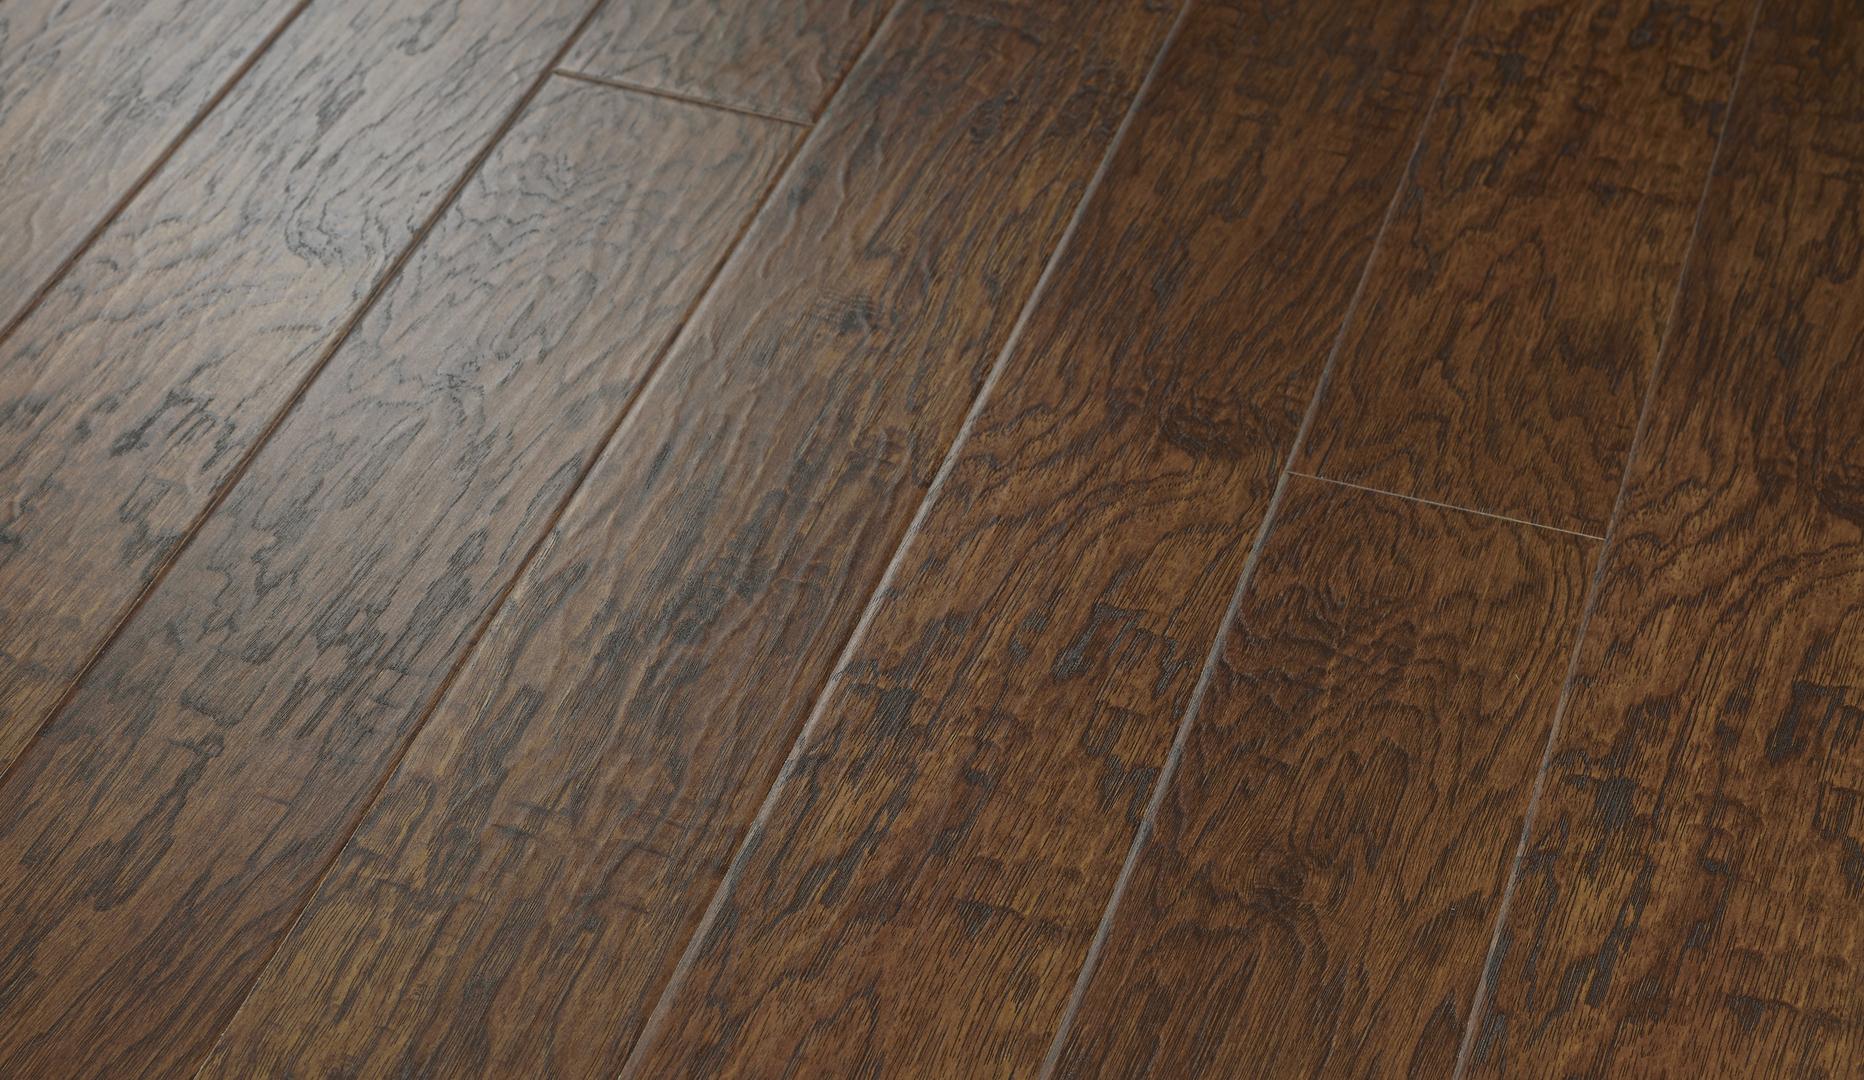 Rustic Gunstock Hickory Laminate Flooring